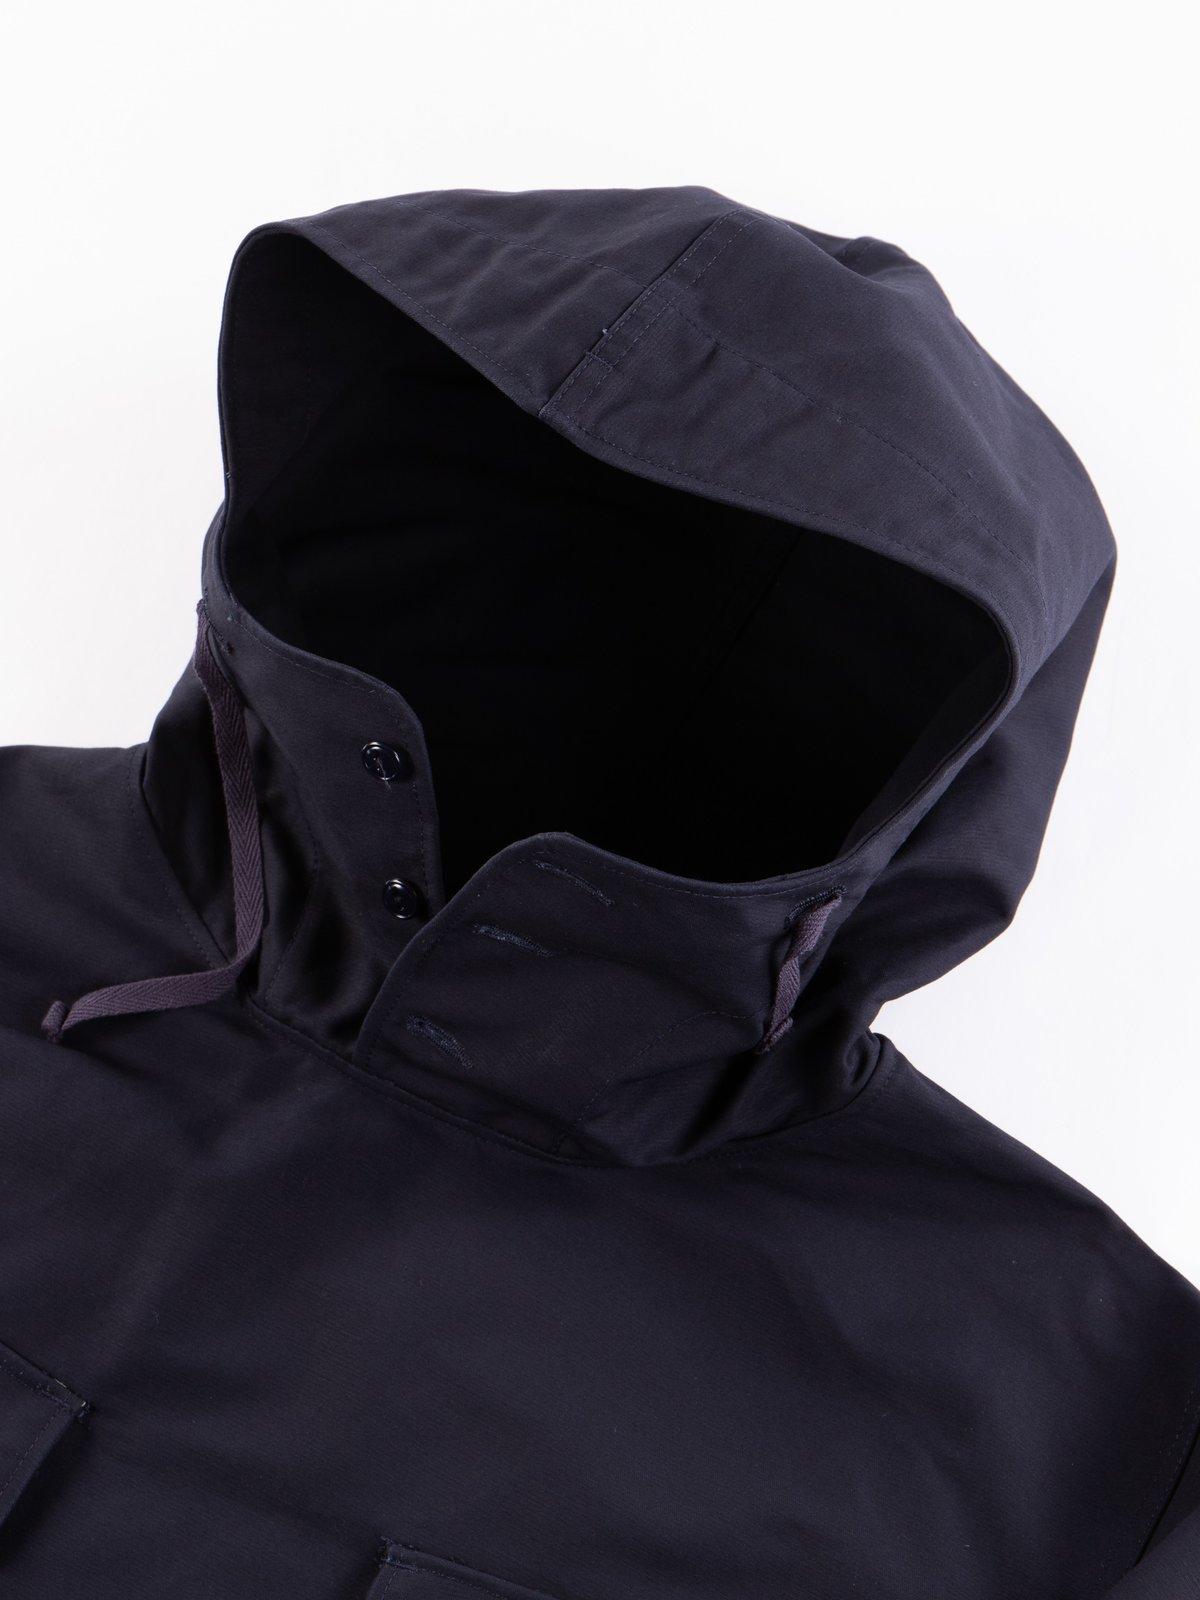 Navy Cotton Double Cloth Cagoule Shirt - Image 5